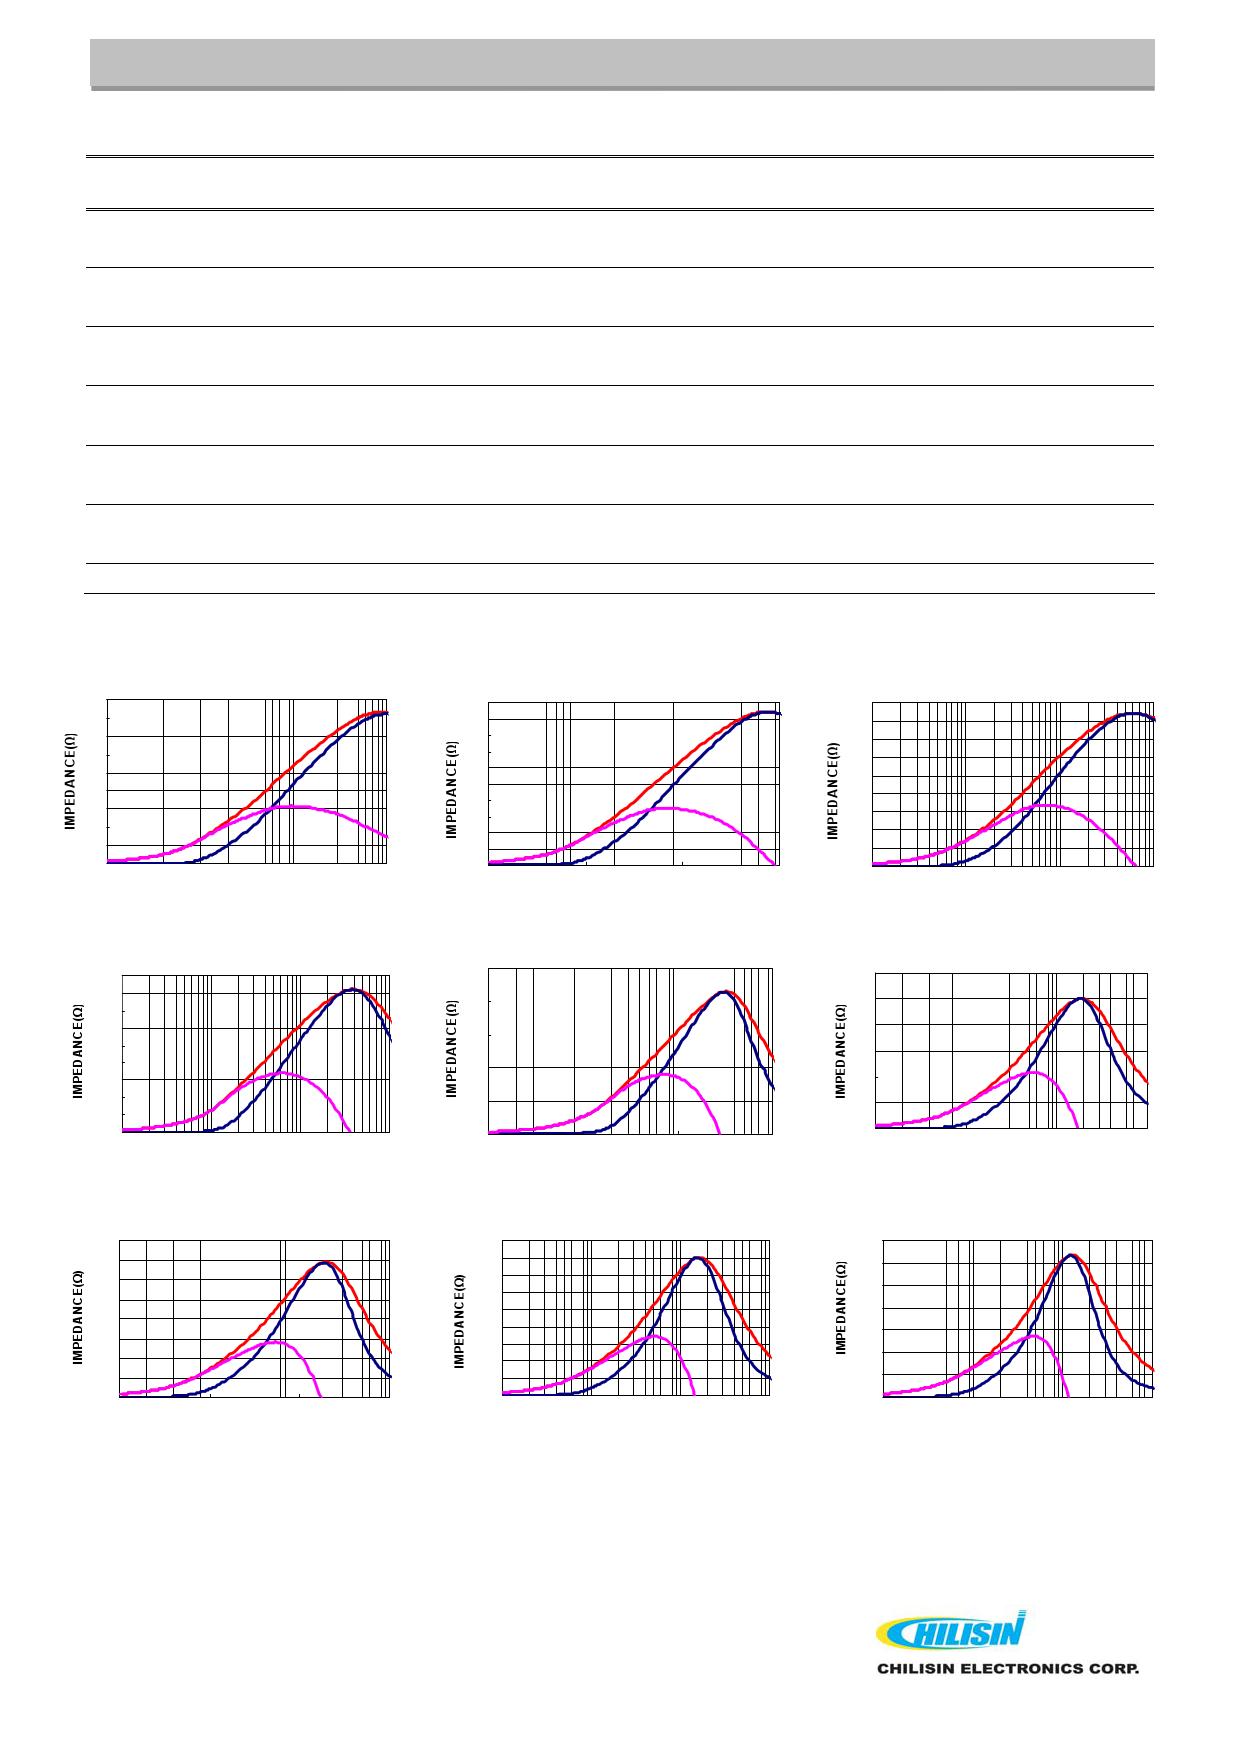 GBY321611T pdf, 반도체, 판매, 대치품